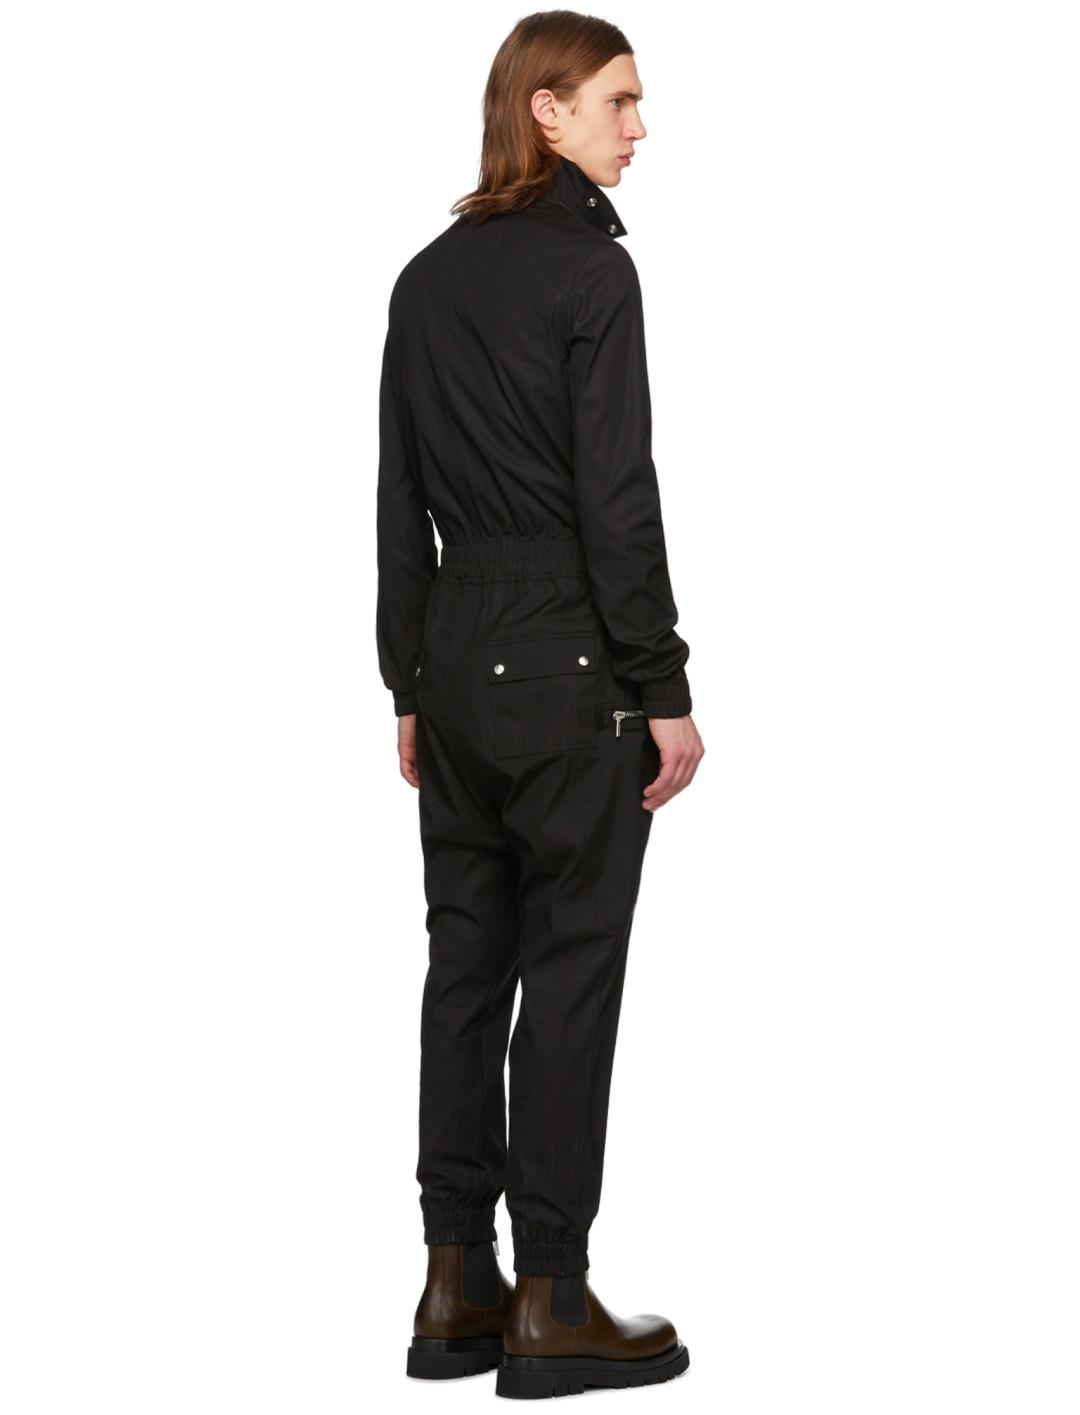 Bodybag Jumpsuit